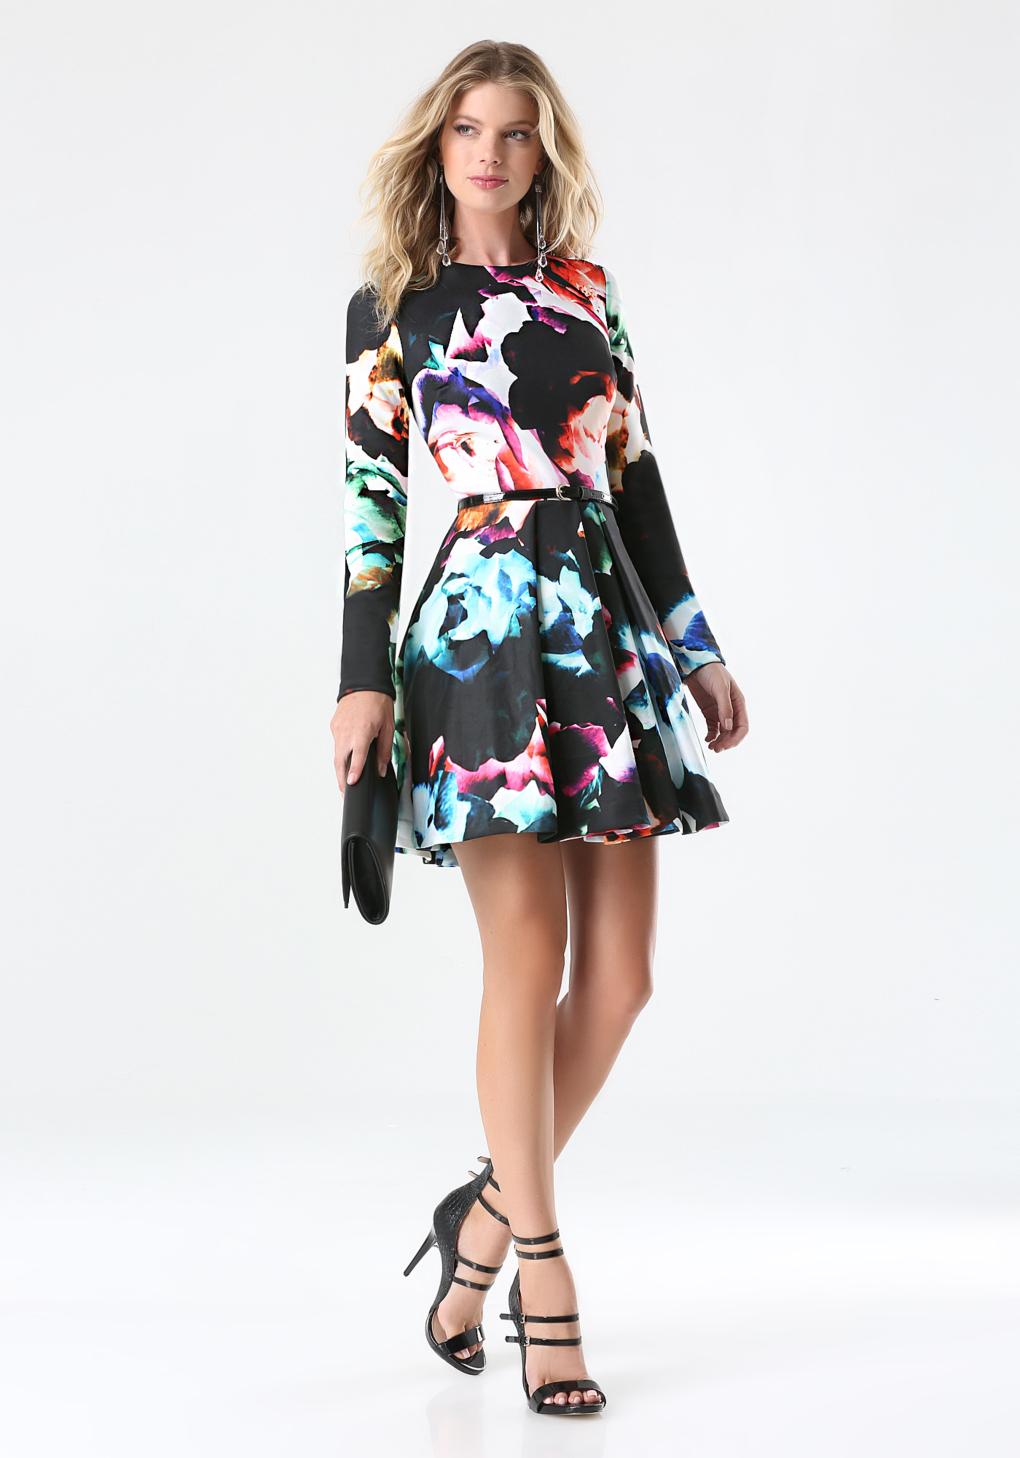 db3a2b232ae Bebe Print Fit   Flare Dress in Black - Lyst